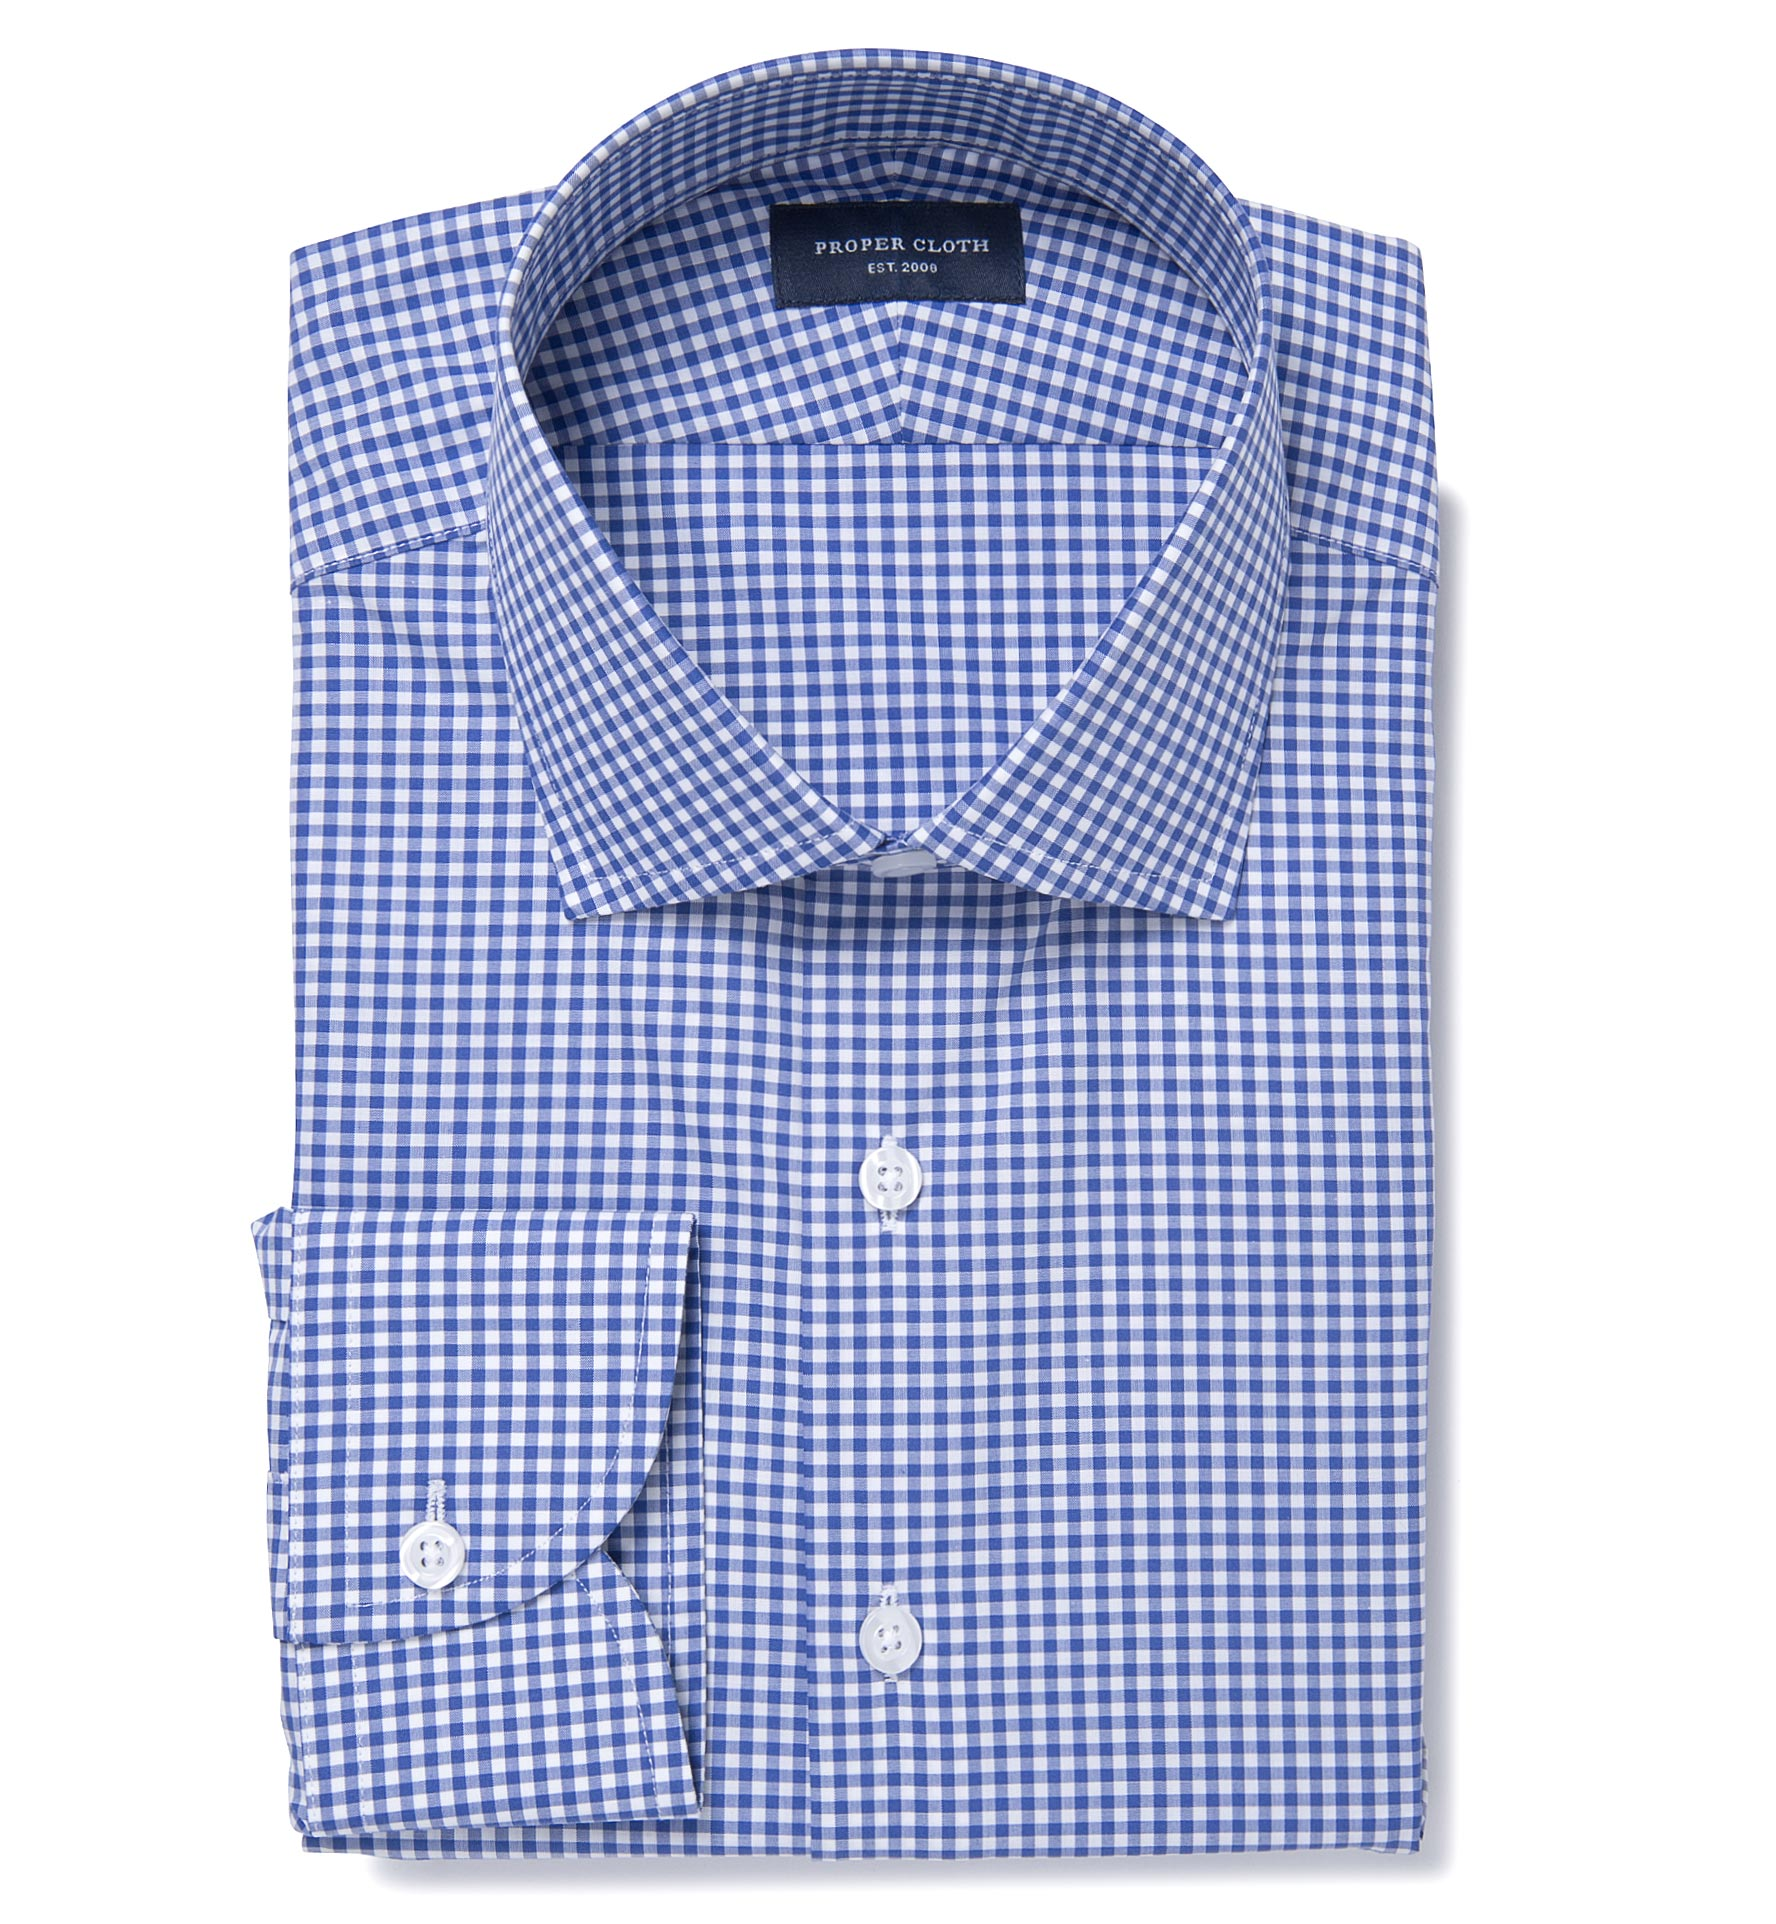 30c8cf68eee Royal Blue And White Dress Shirt - Nils Stucki Kieferorthopäde